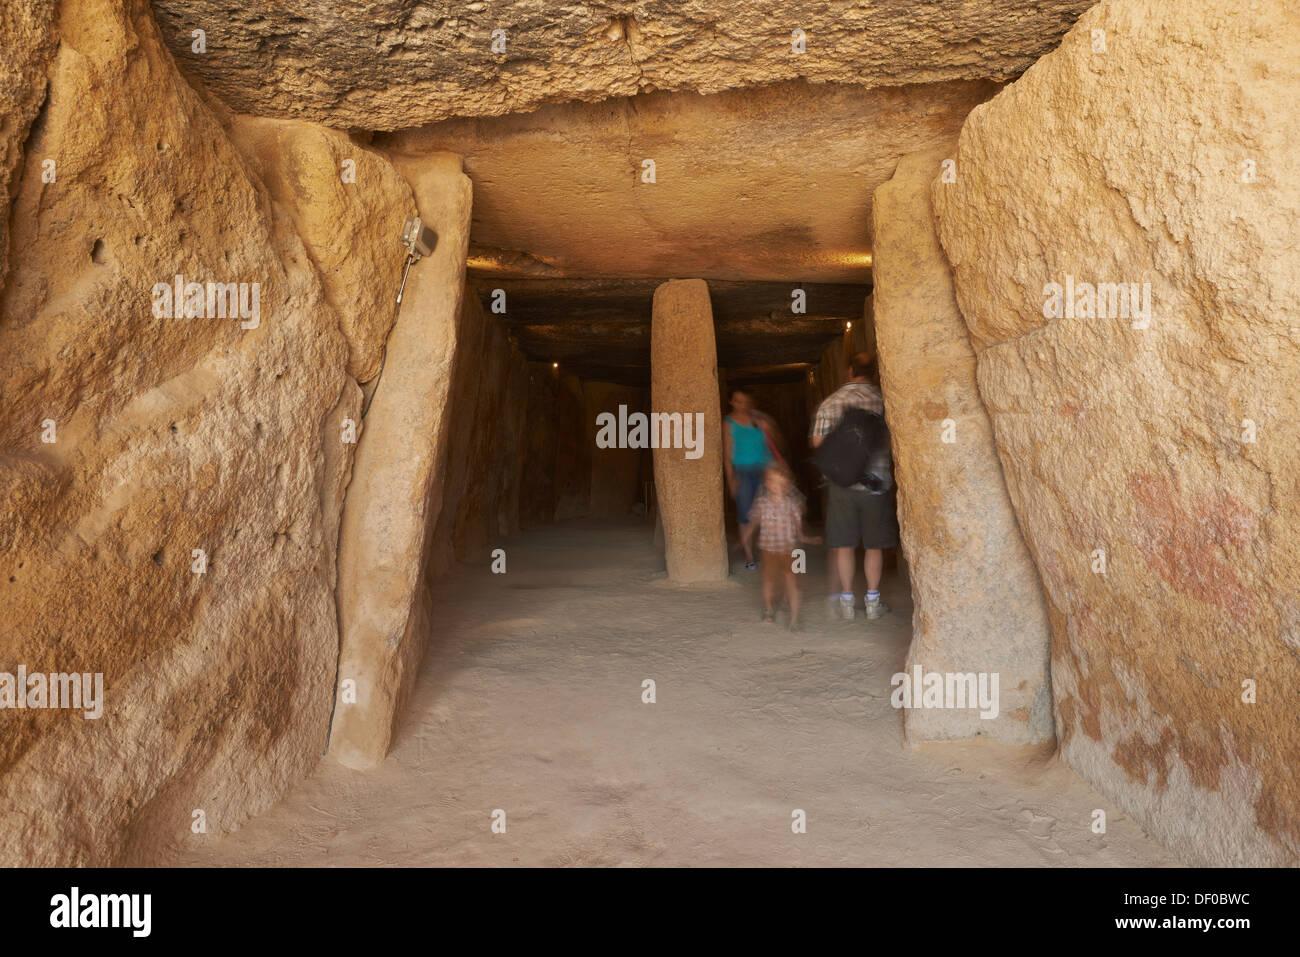 Dolmen of Menga, Menga Megalithic Dolmen, Antequera, Málaga province, Andalusia, Spain - Stock Image